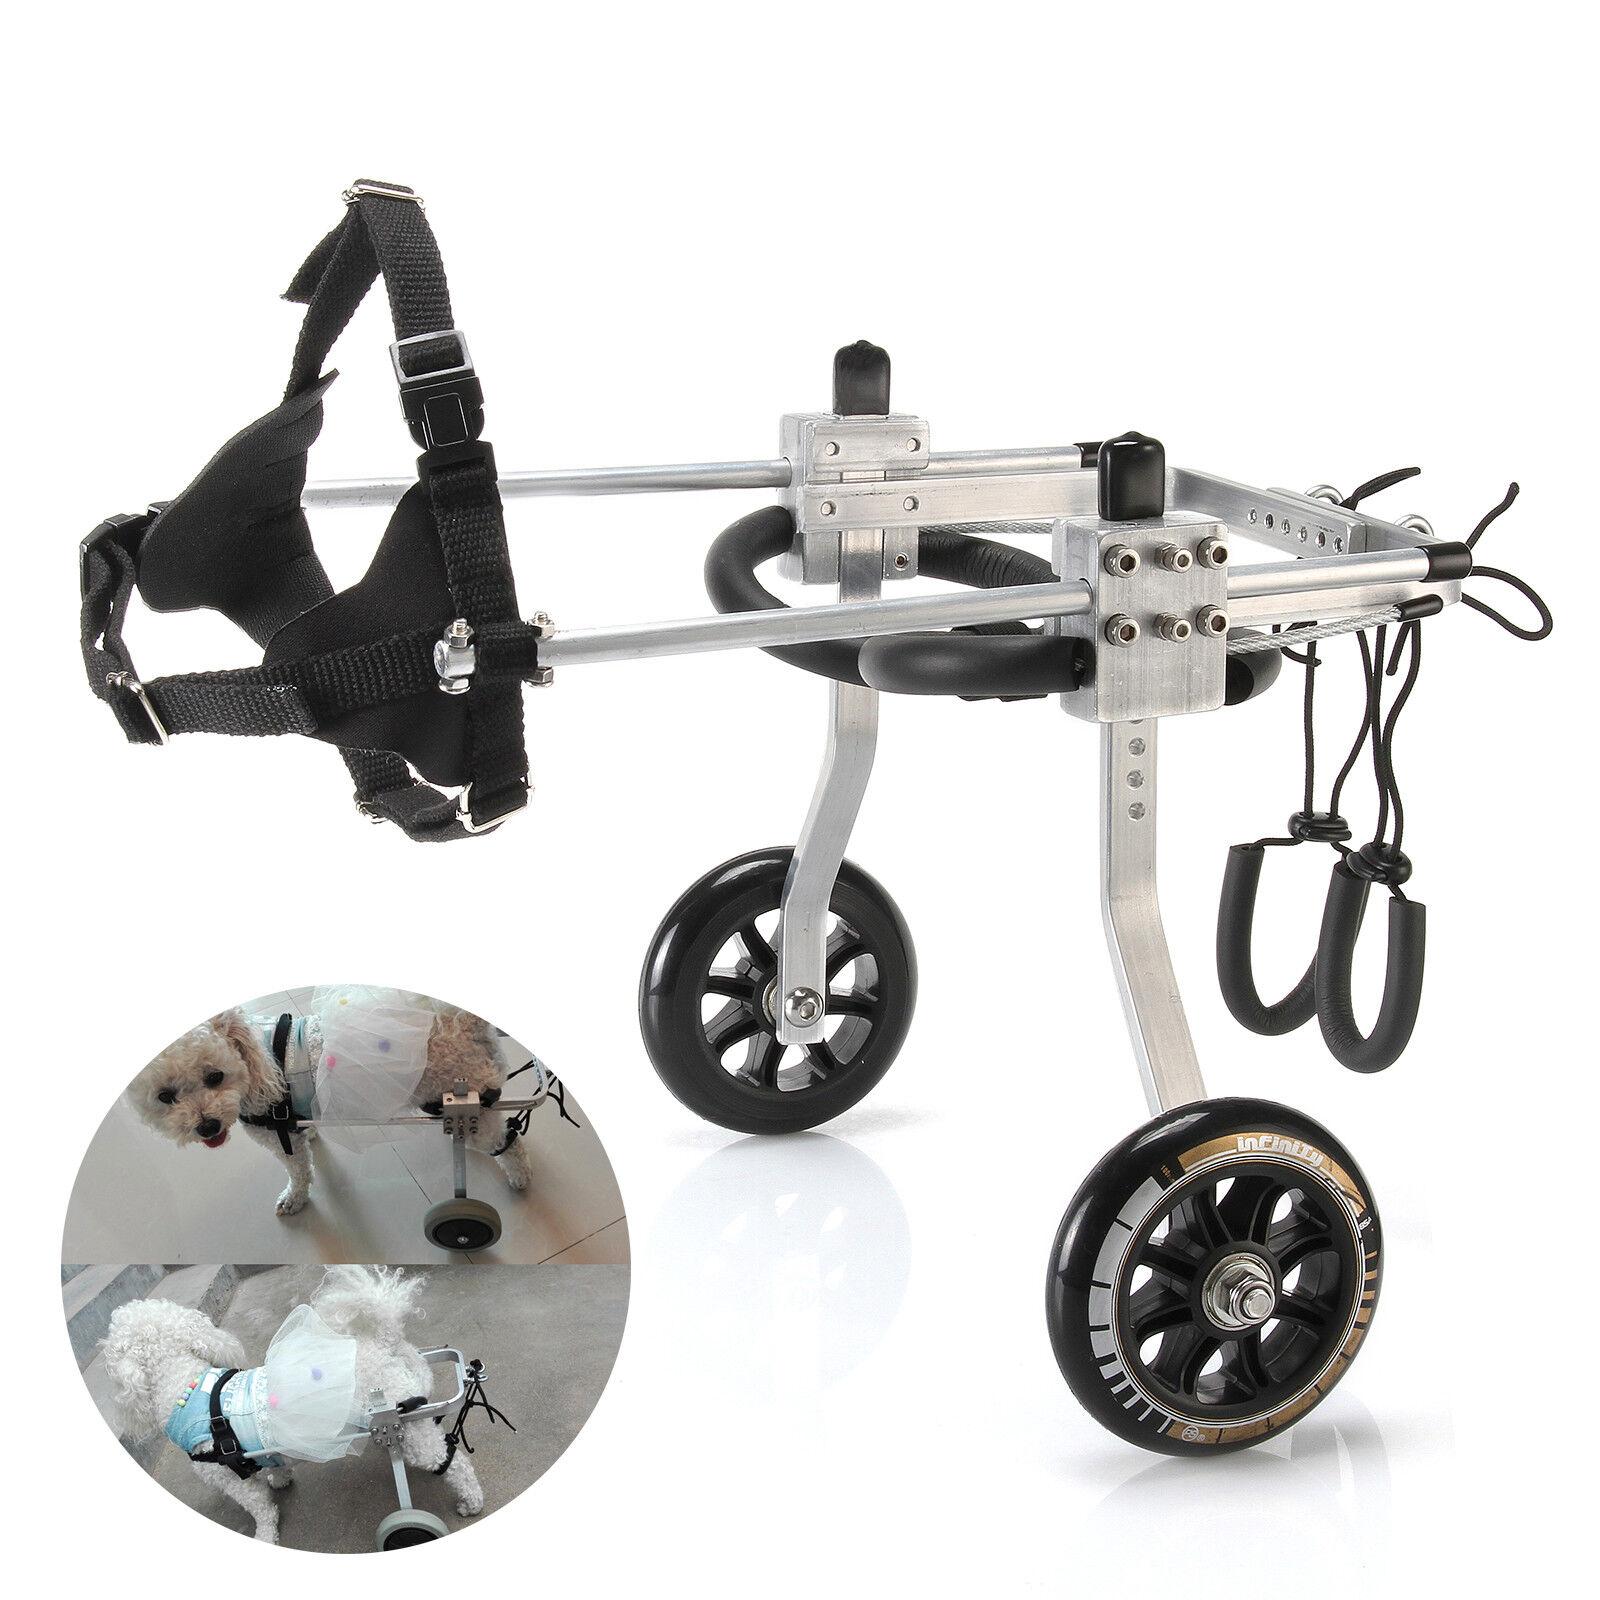 marchi di moda Pet 3-15lb Small 2-Wheel Wheelchair for Behind legs Handicapped Hind Hind Hind Leg Dog  compra meglio